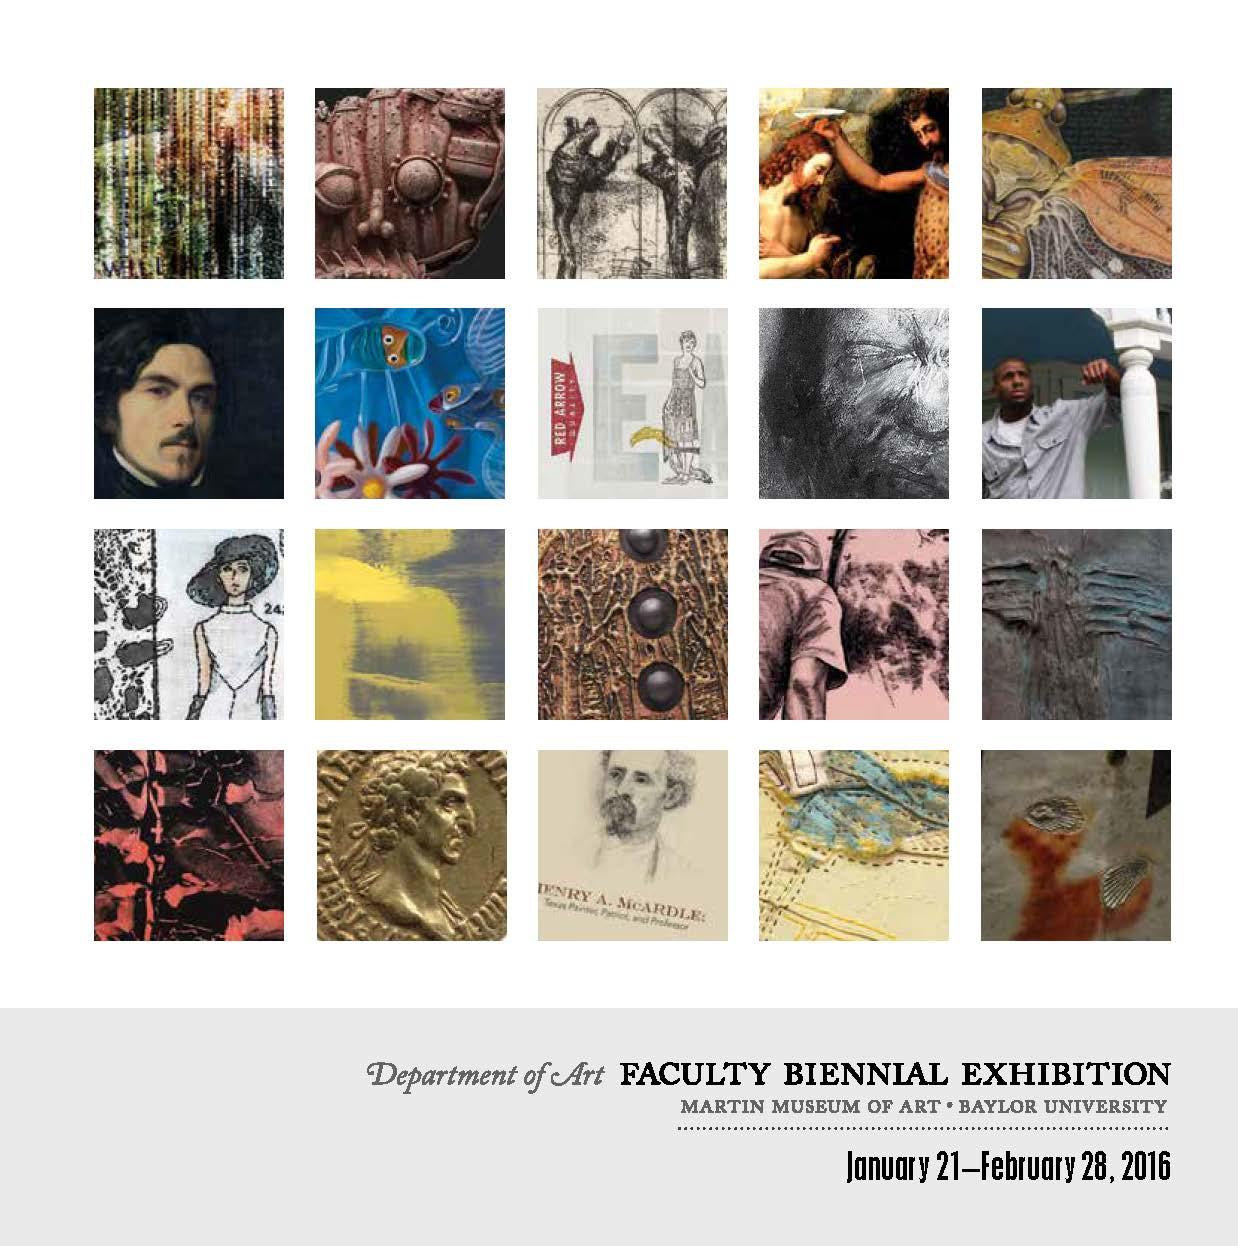 2016 Dept of Art Faculty Biennial Exhibition Catalog_Page_01